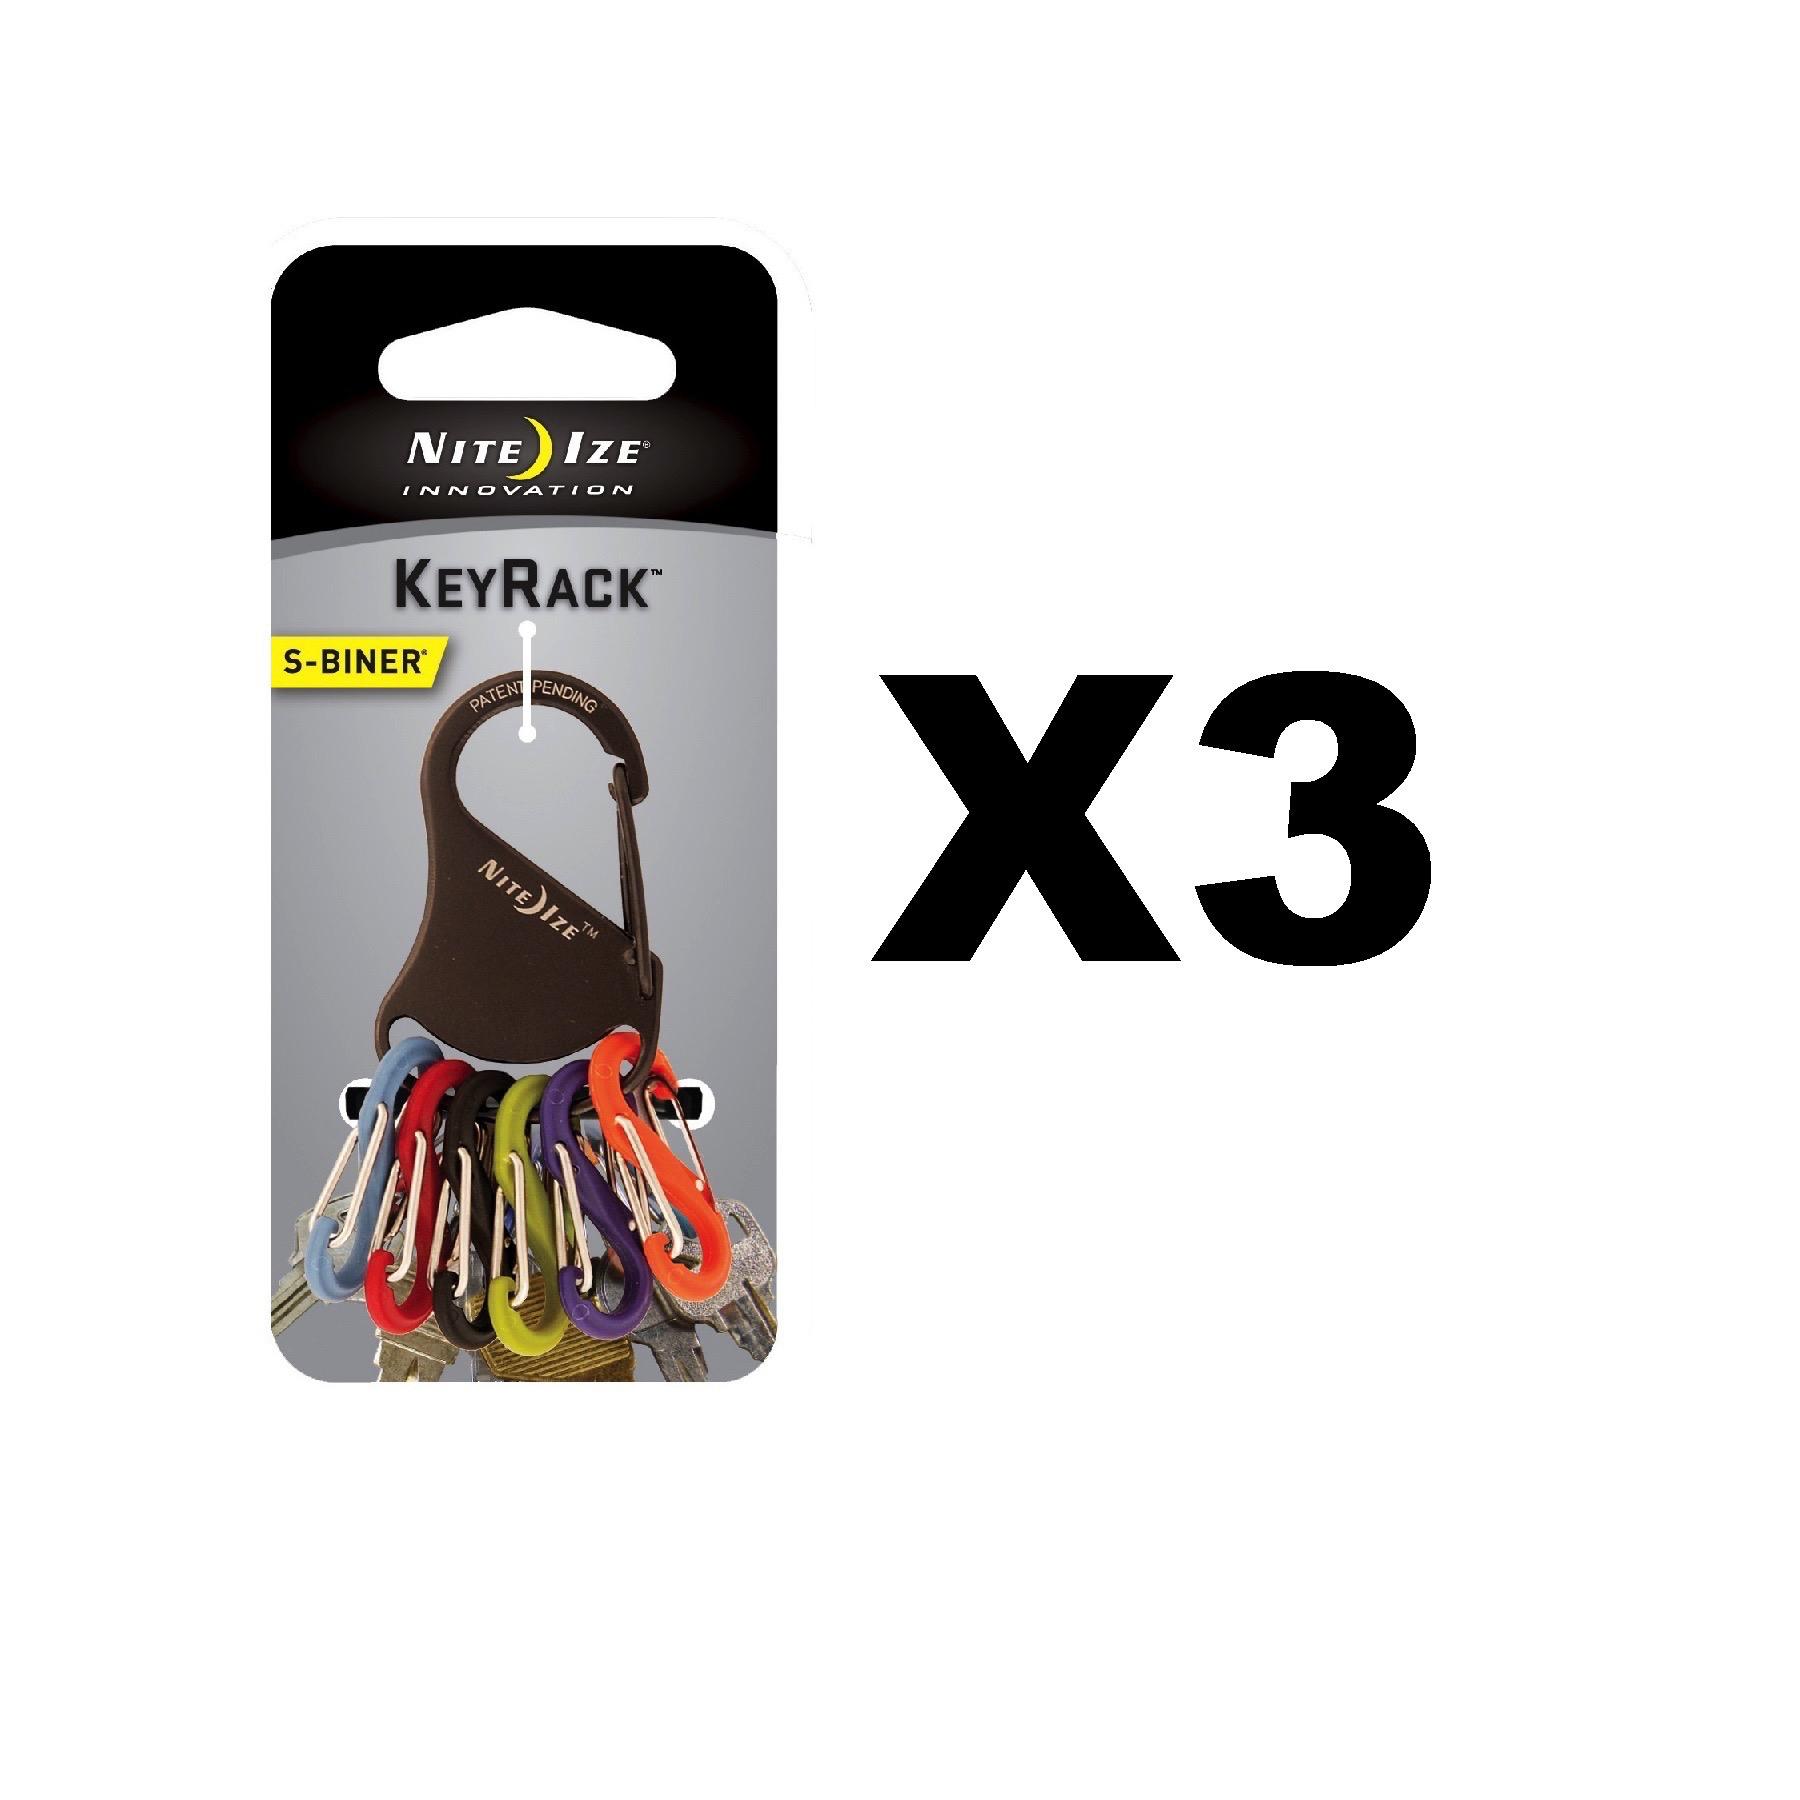 Nite Ize S-Biner KeyRack Black Stainless Steel Keychain Biner w//Plastic S-Biners